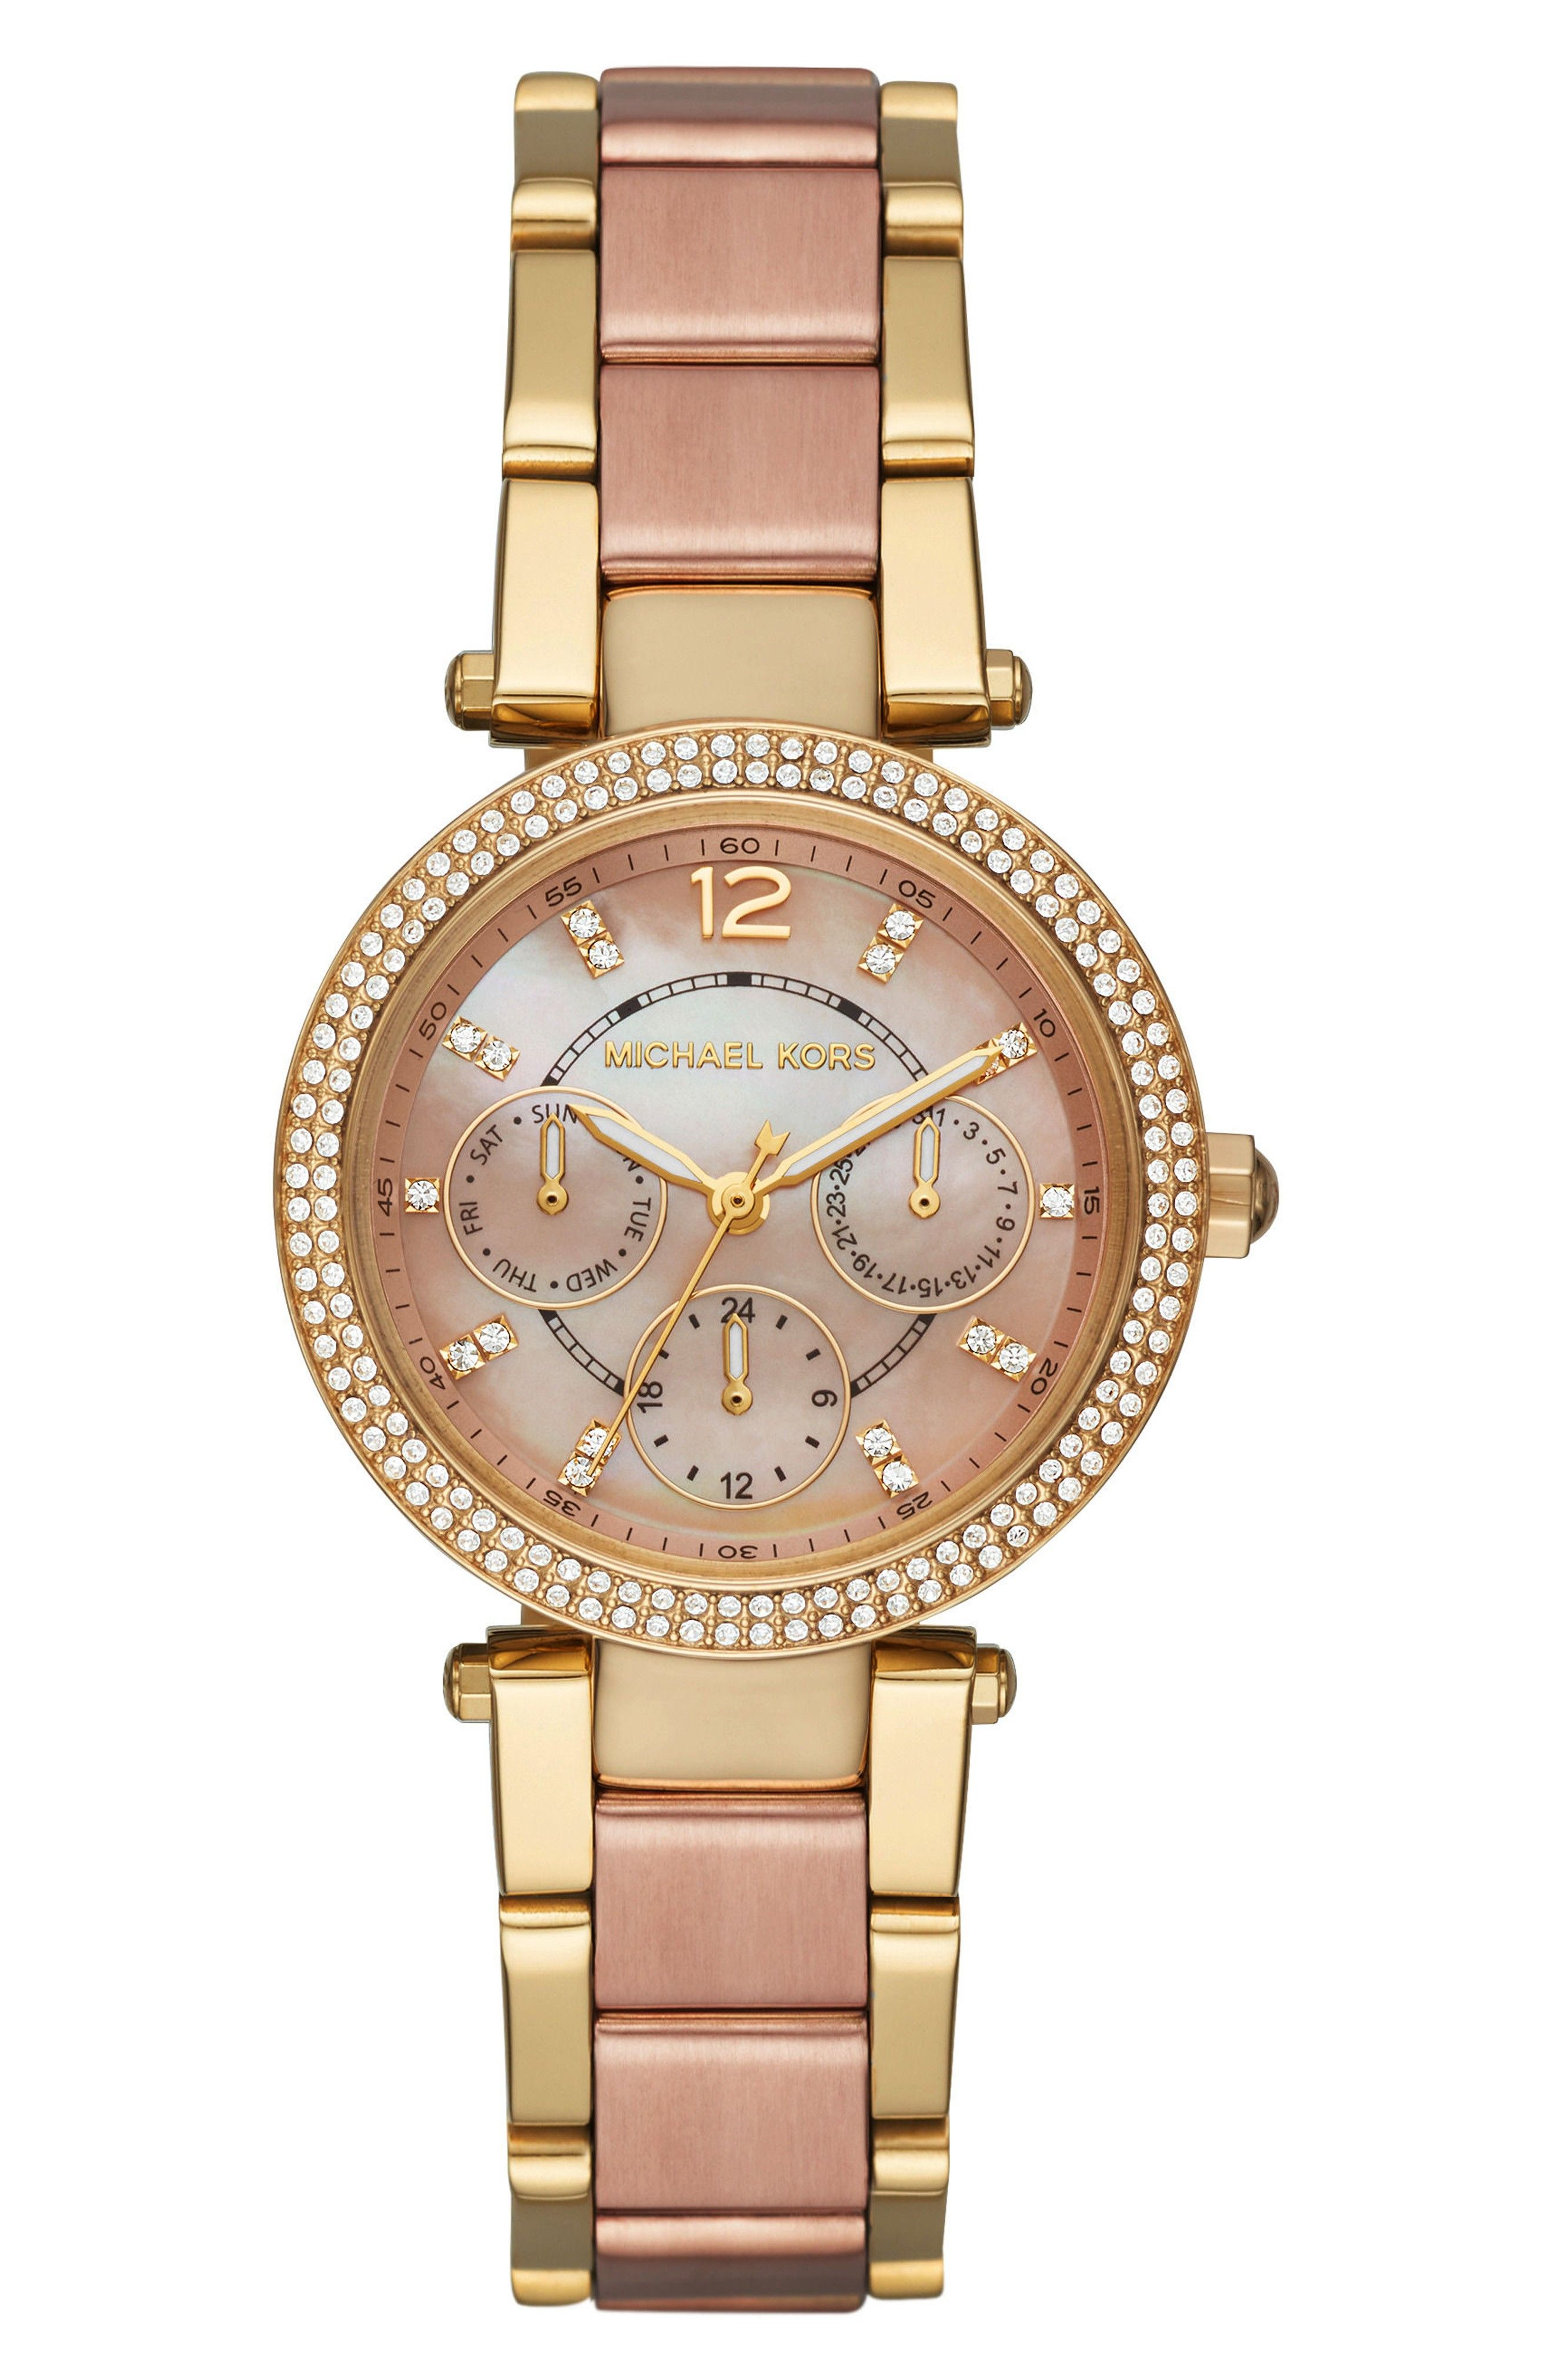 Rose Gold Watch Bracelet Watches Women Michael Kors Ritz Bracelet Watch